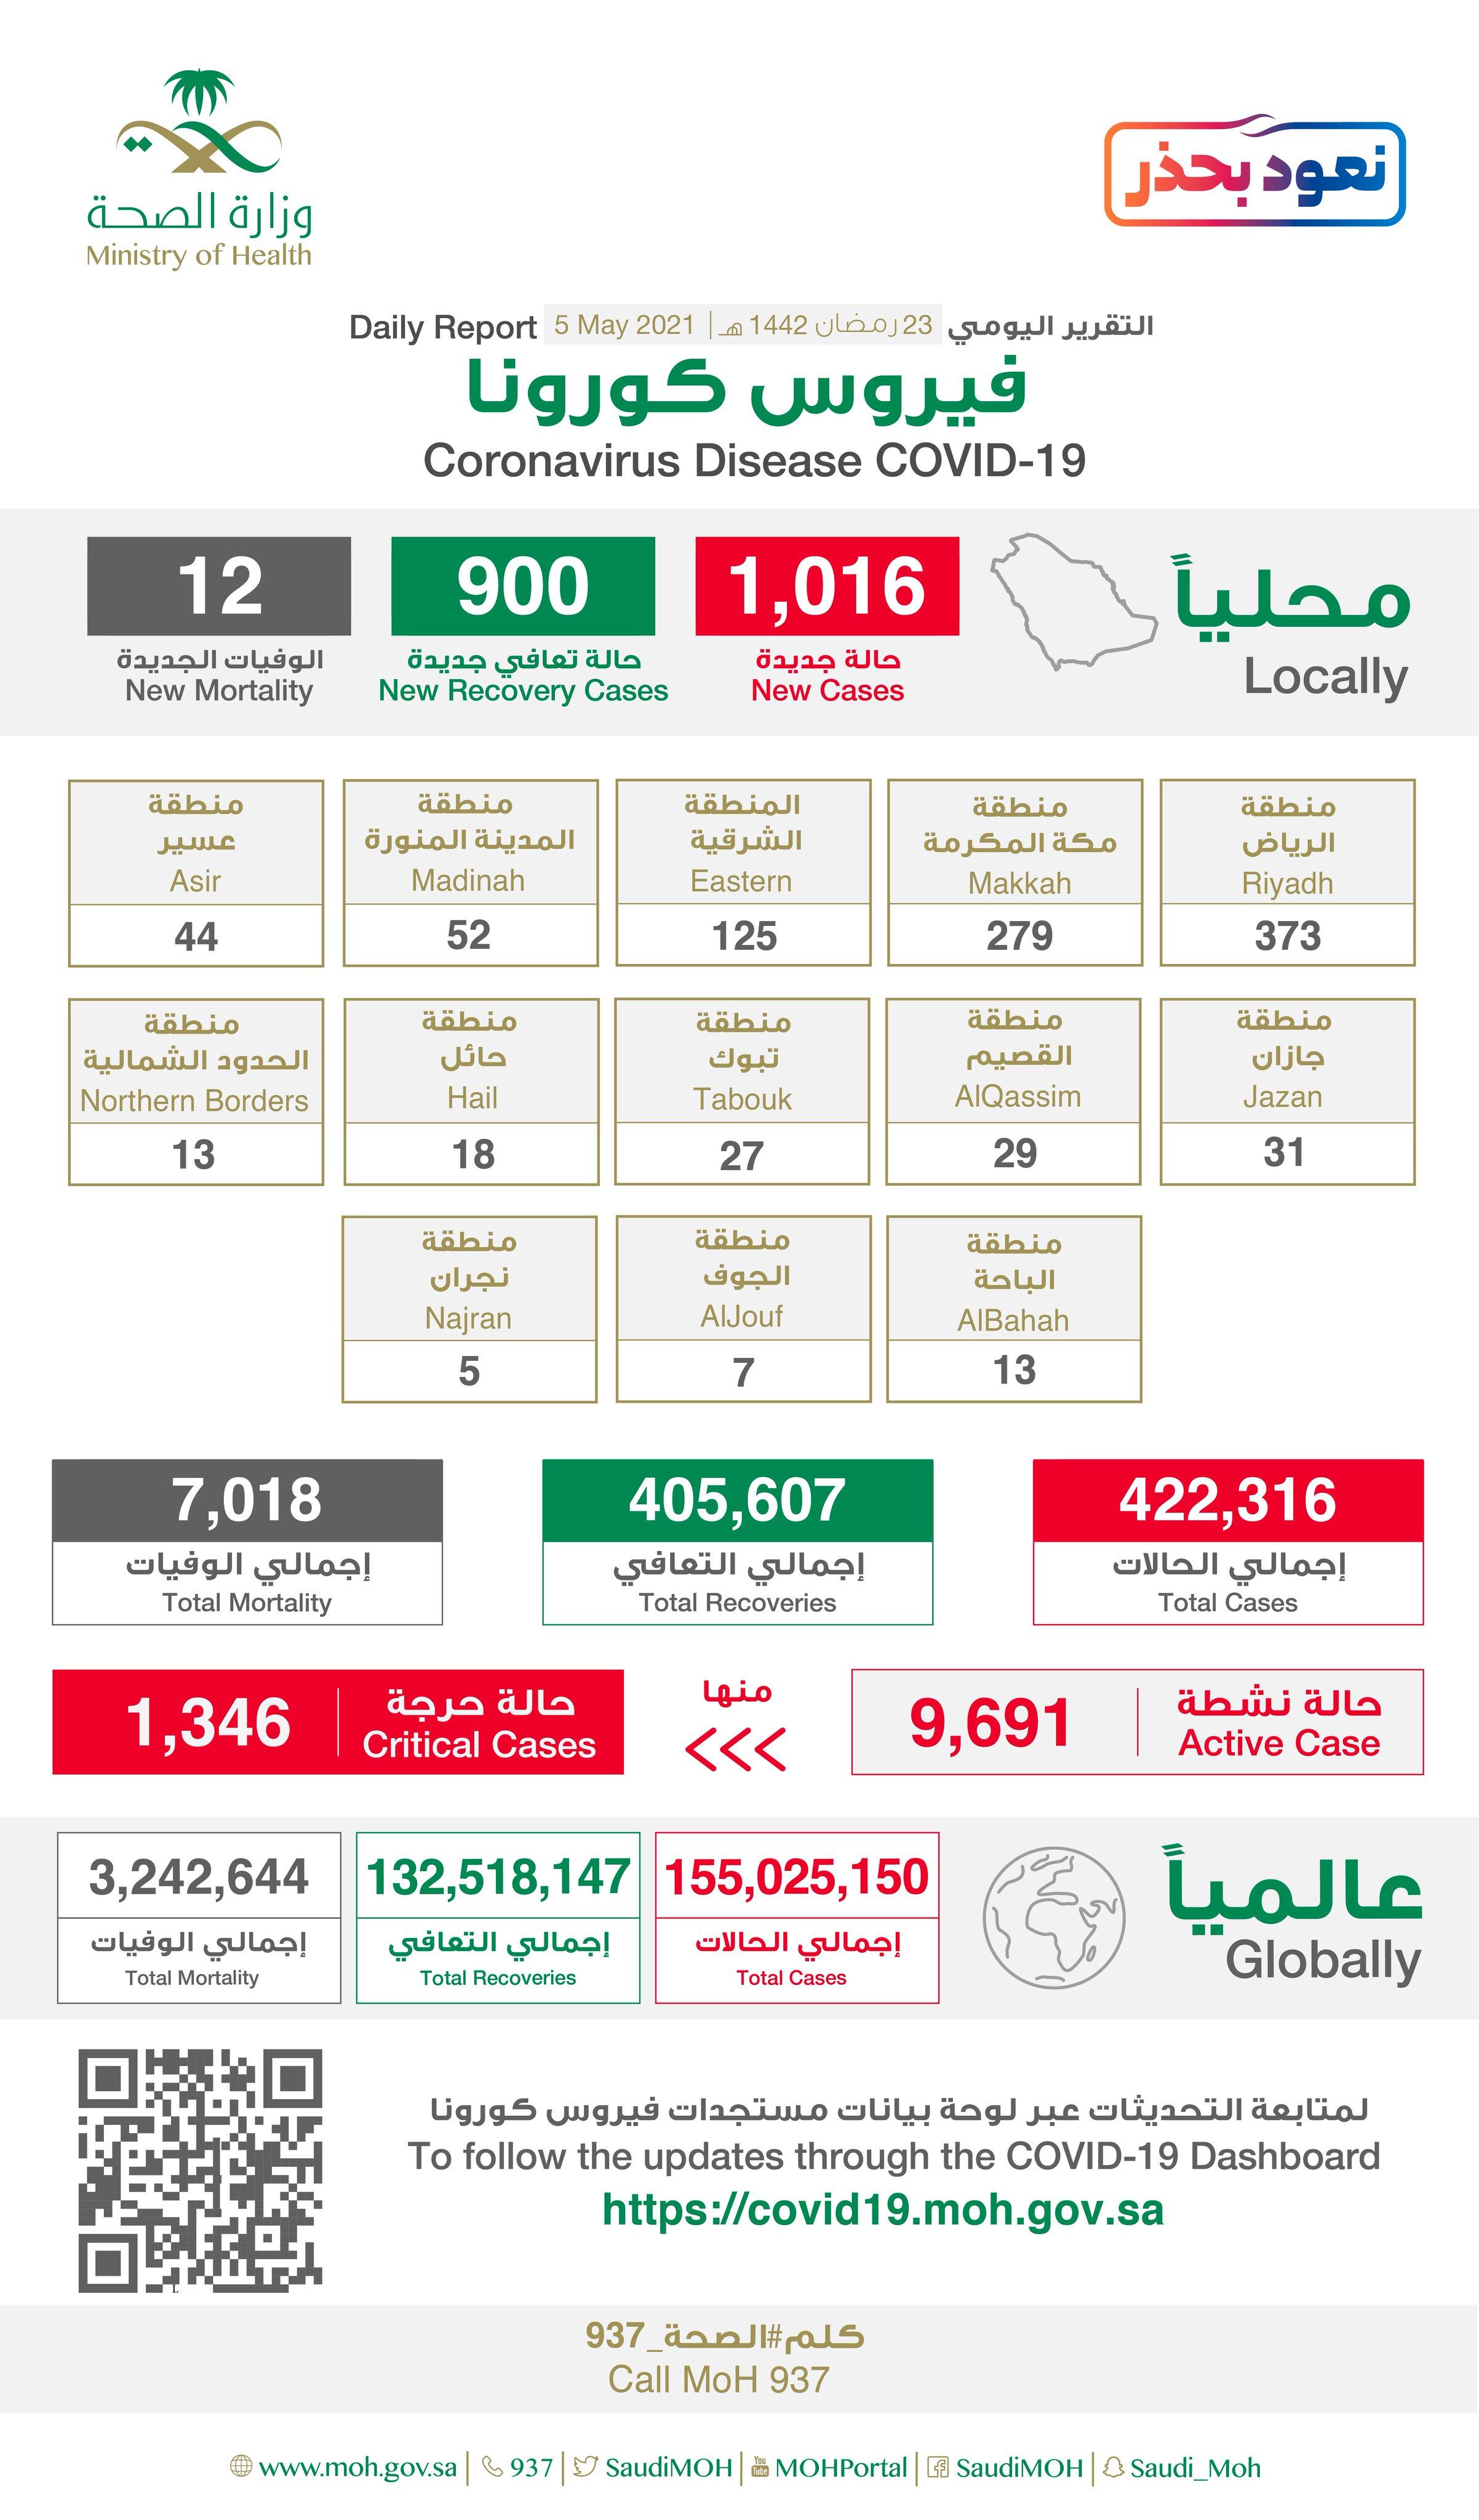 Saudi Arabia Coronavirus : Total Cases :422,316 , New Cases : 1,016 , Cured : 405,607 , Deaths: 7,018, Active Cases : 9,691